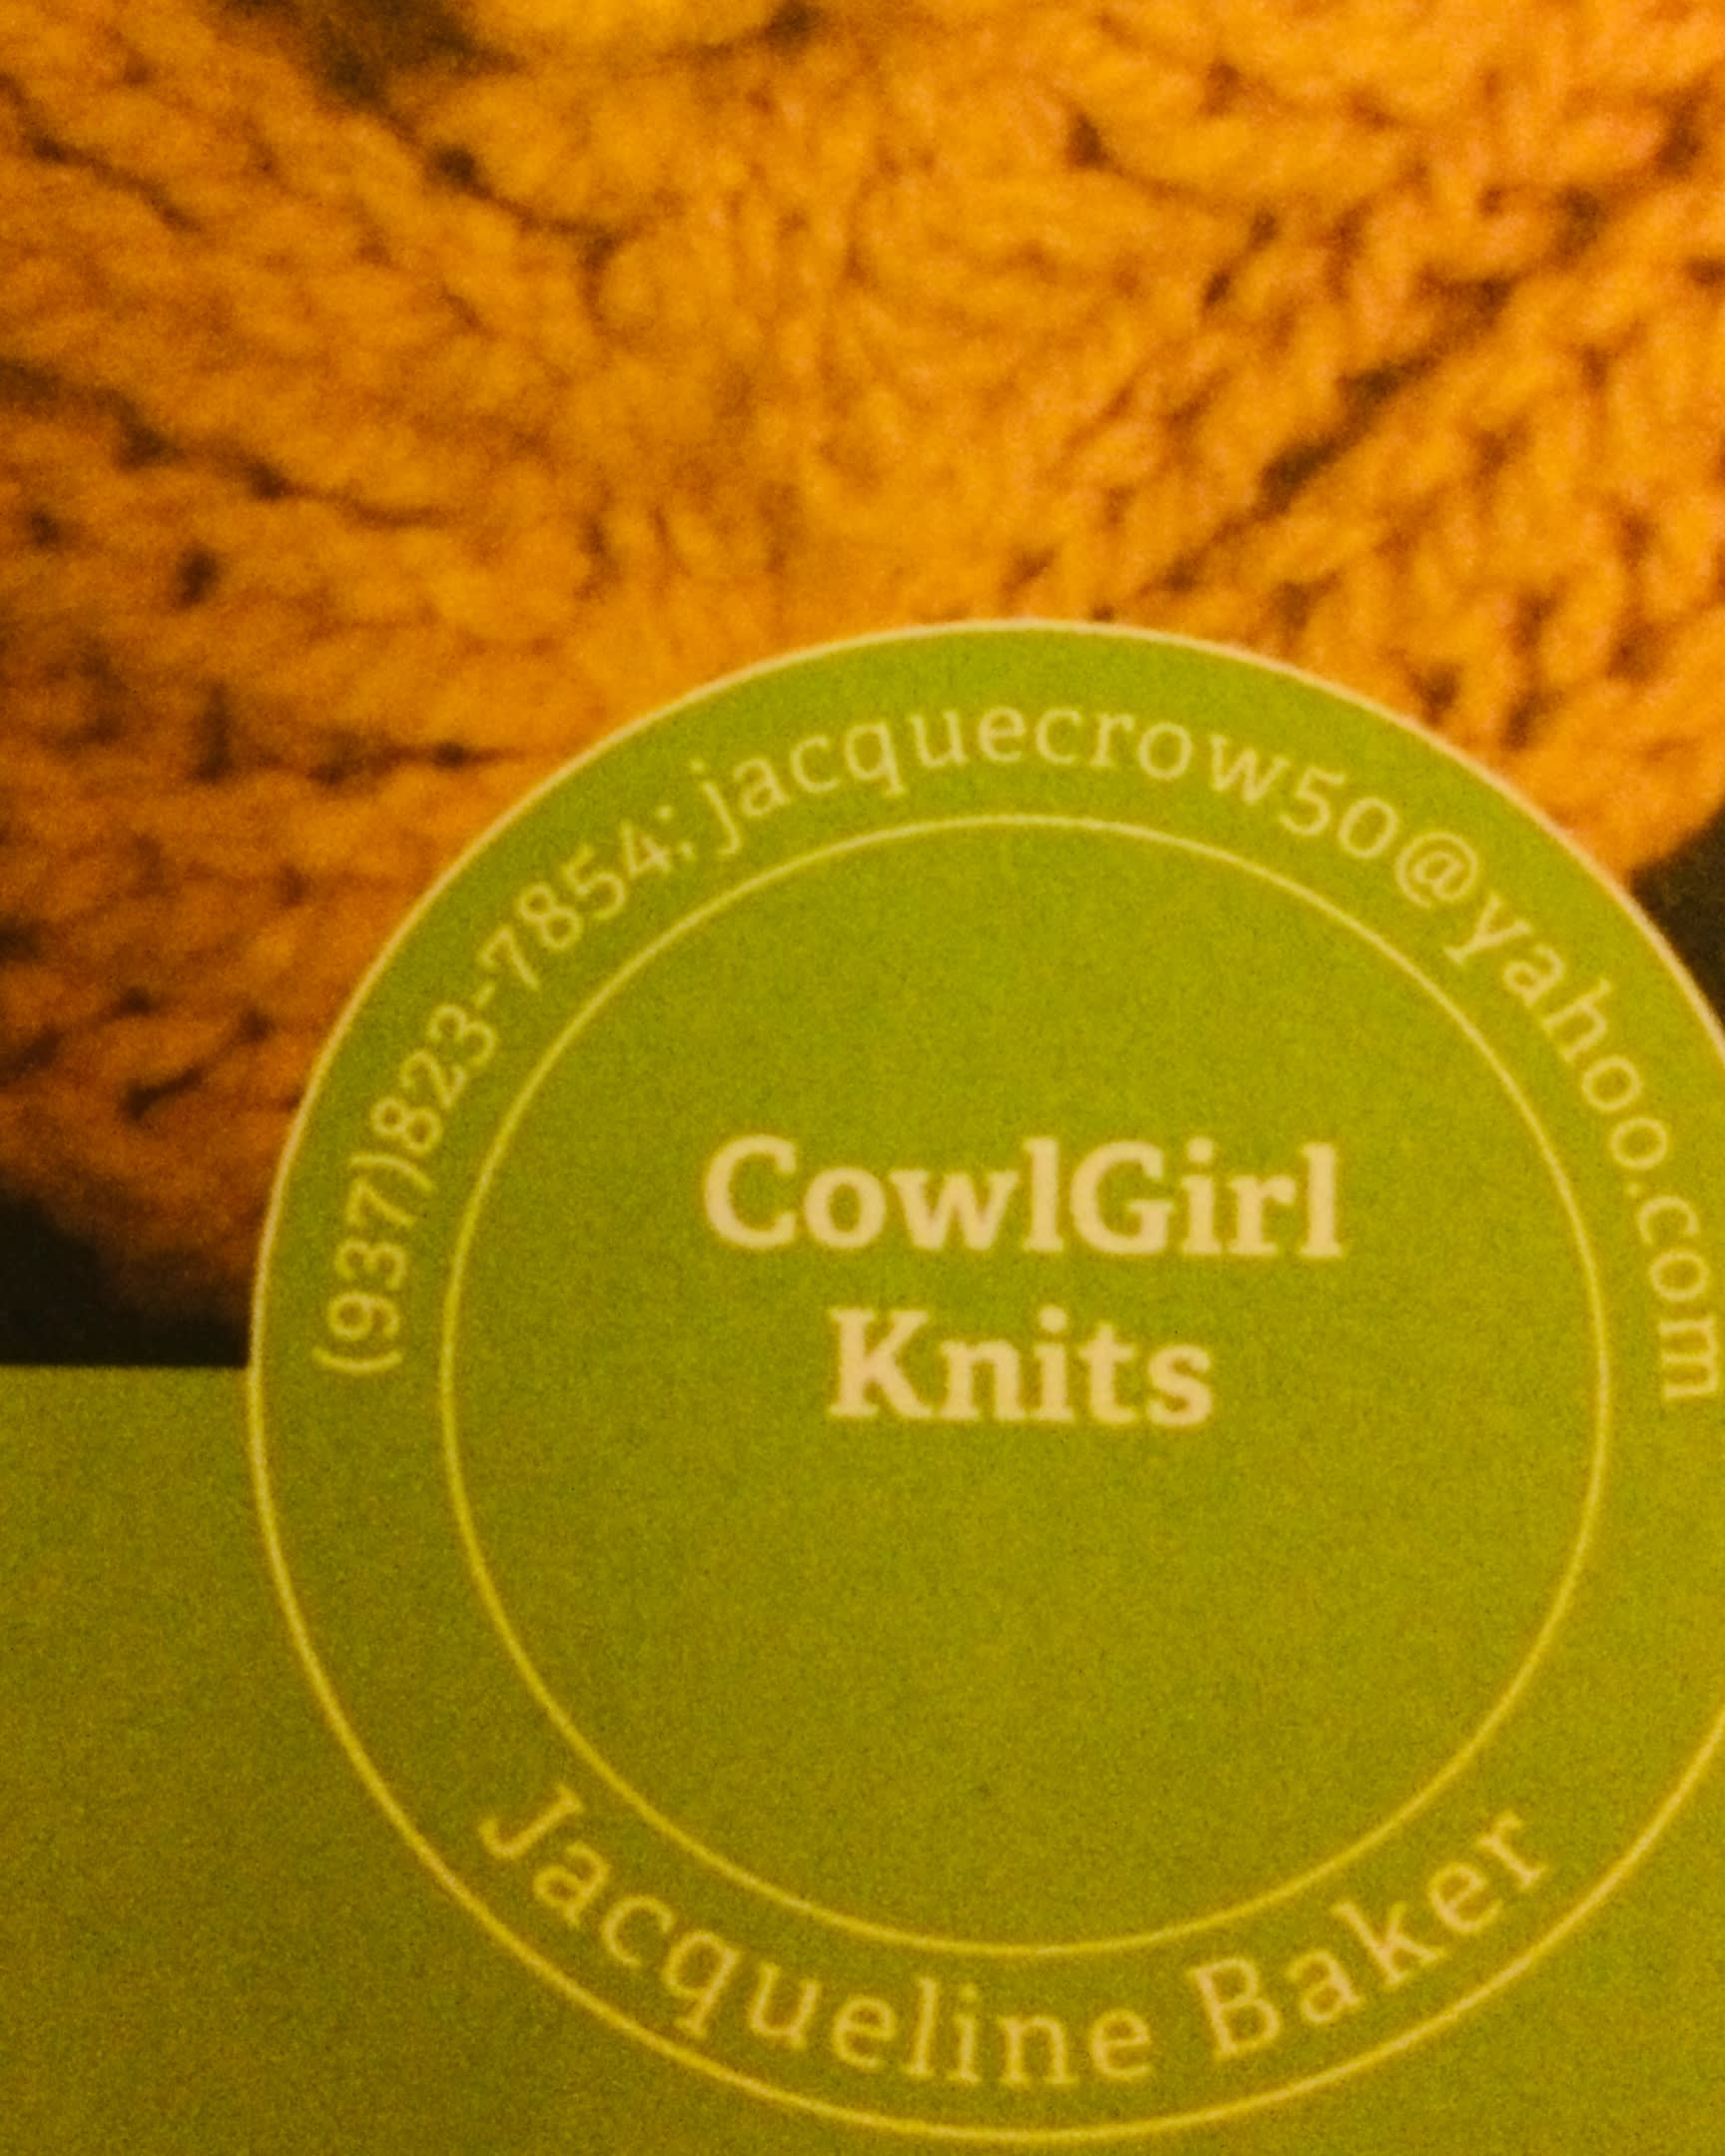 Cowlgirl Knits